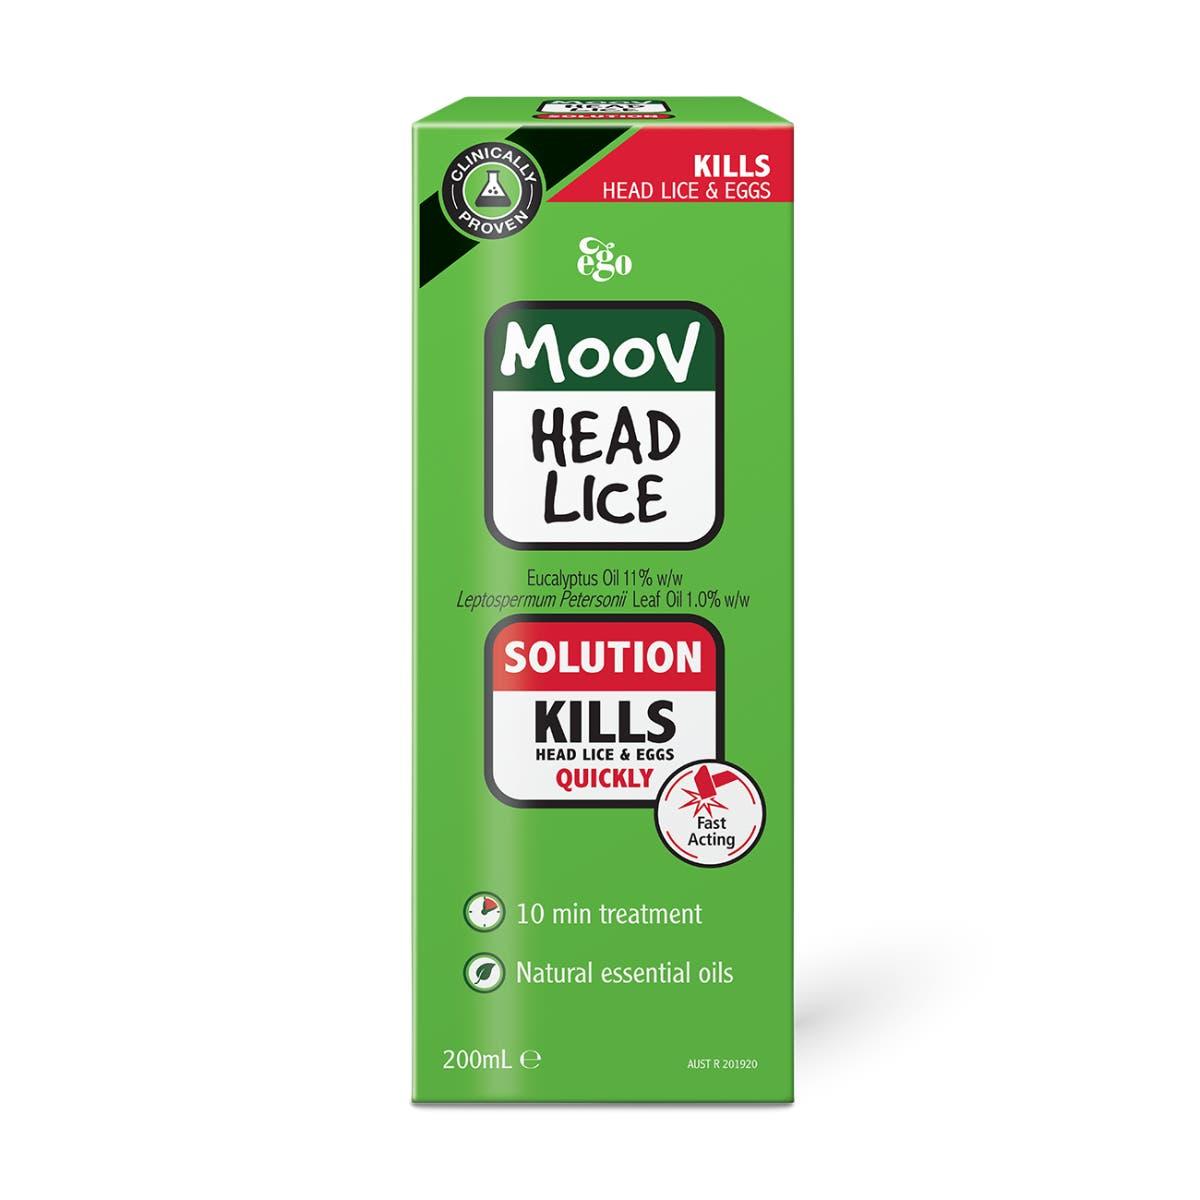 MOOV Head Lice Solution 200mL